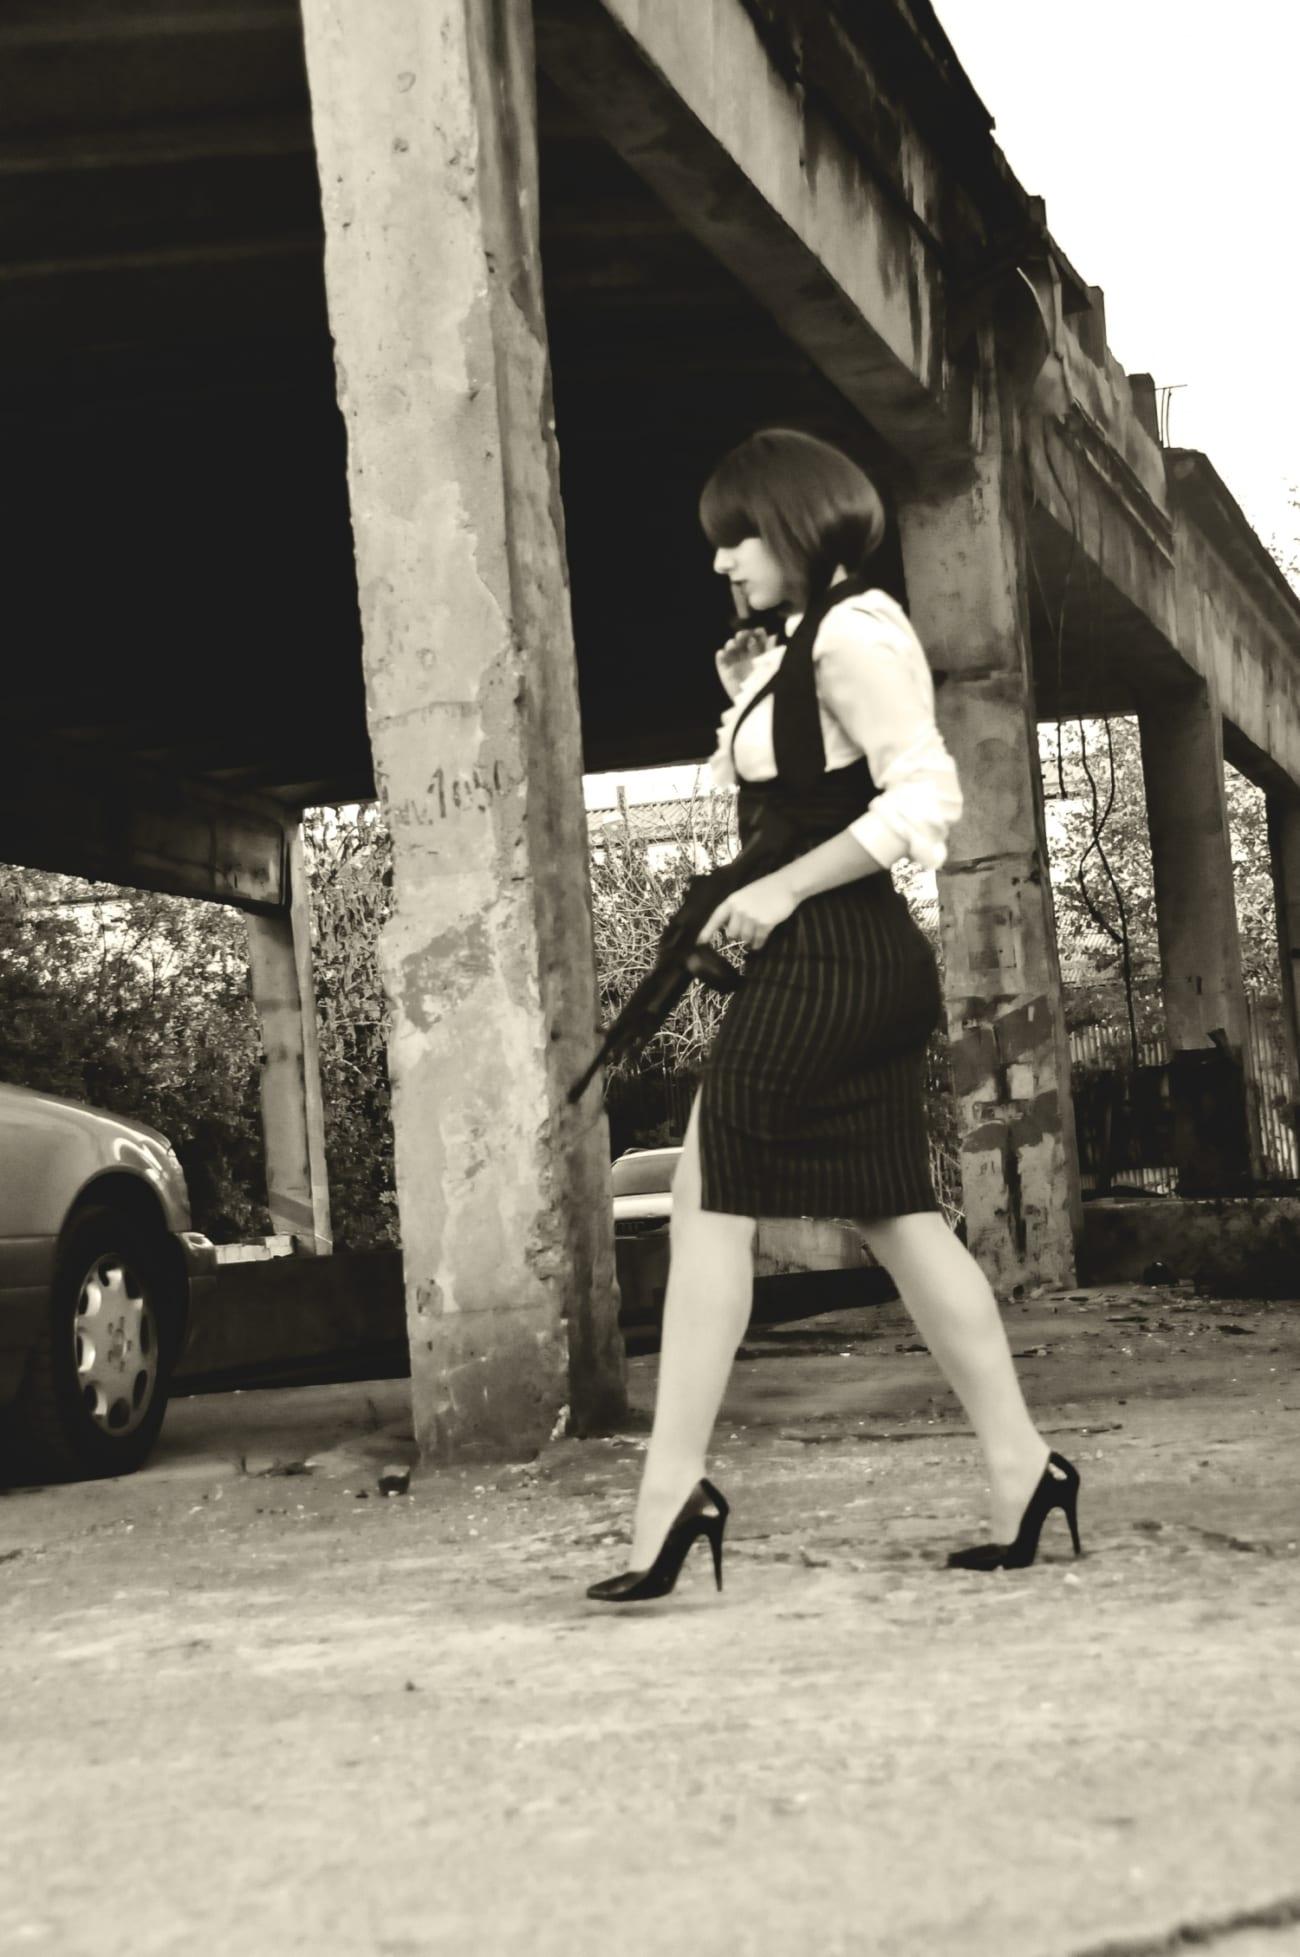 roxi rose halloween mafia fashion blog romania gangsta costume italiano clarice gravano (12)